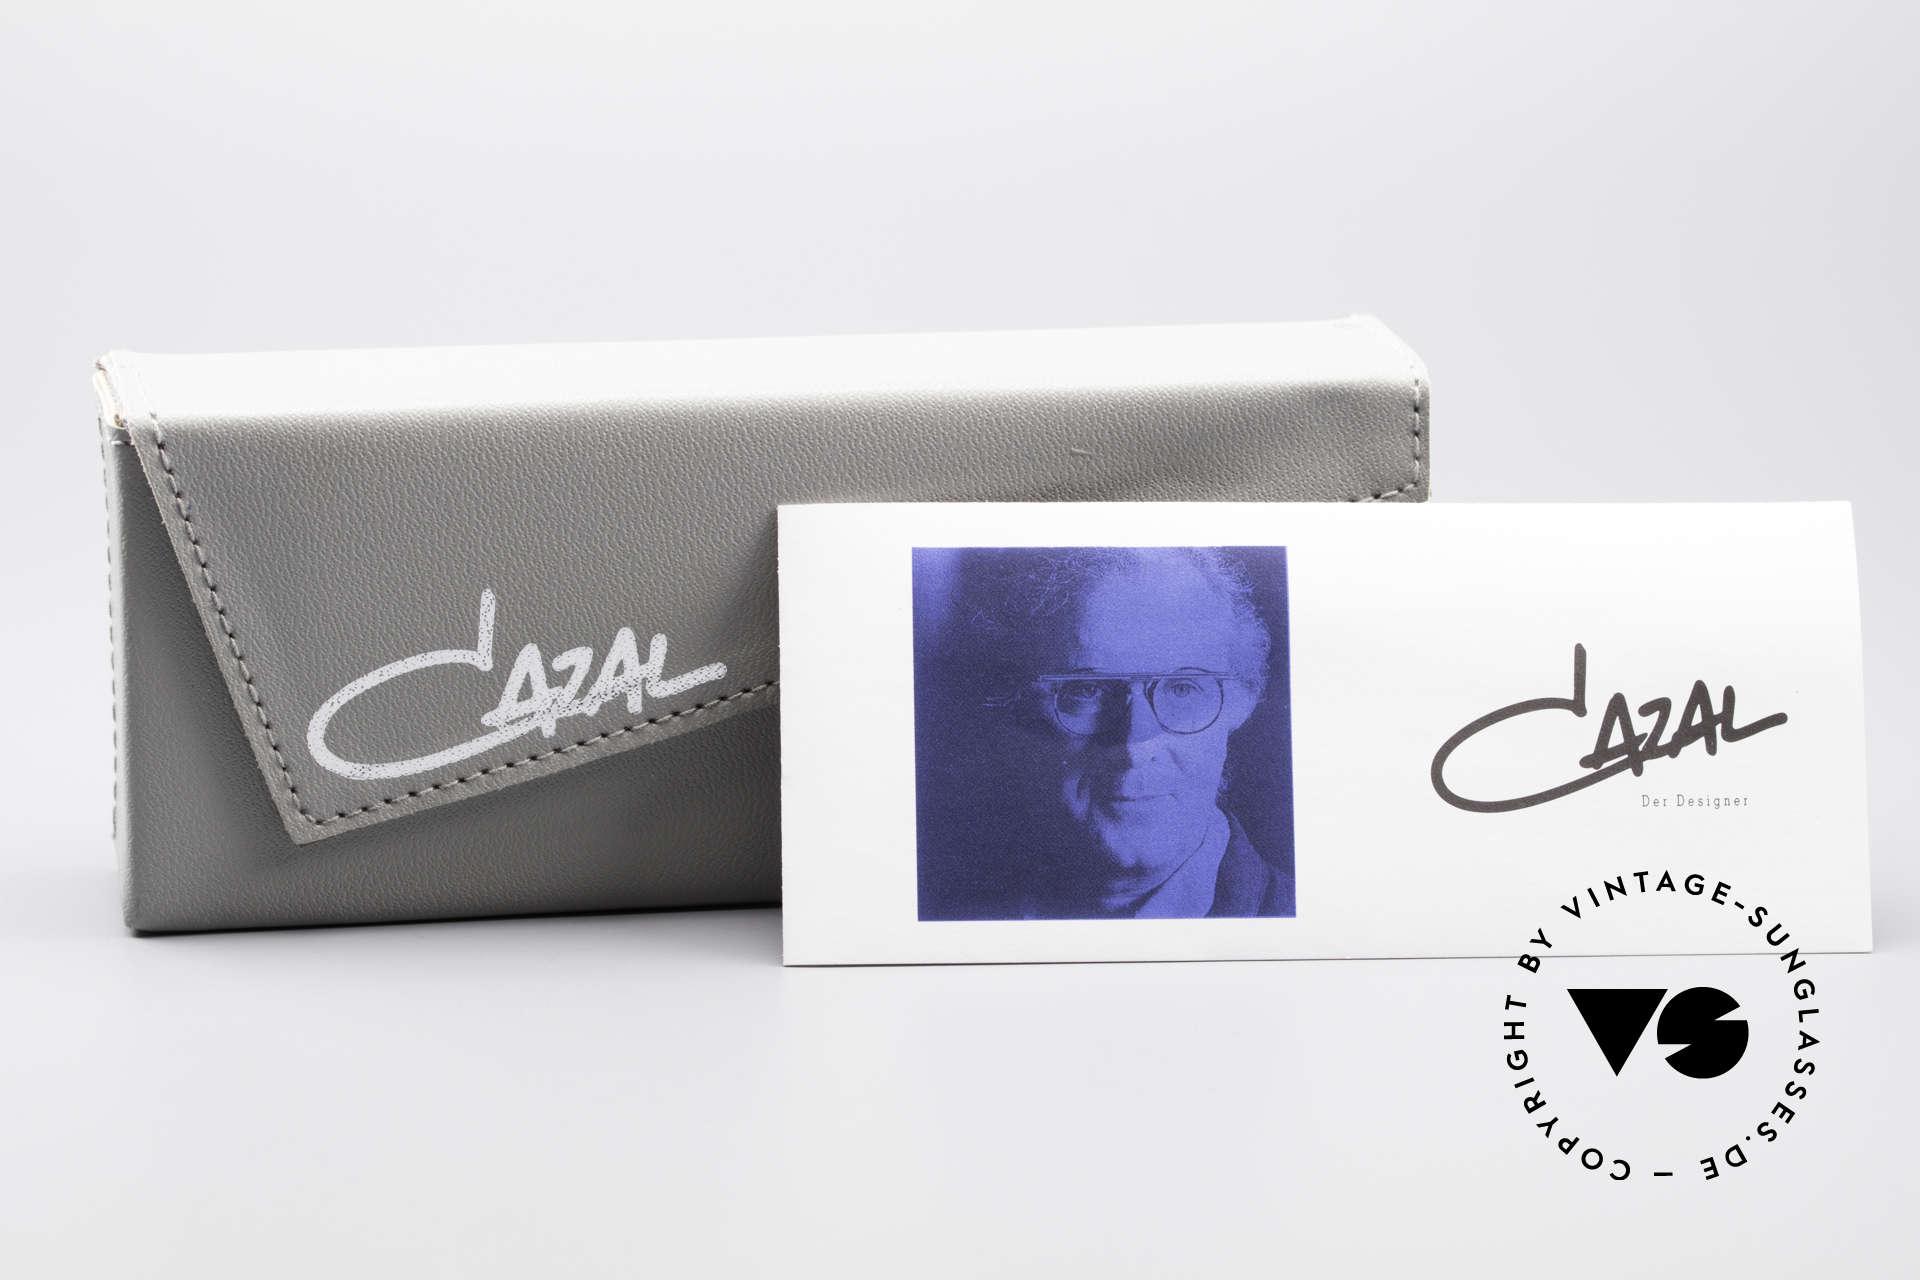 Cazal 630 Old 80's Hip Hop Cazal Glasses, Size: large, Made for Men